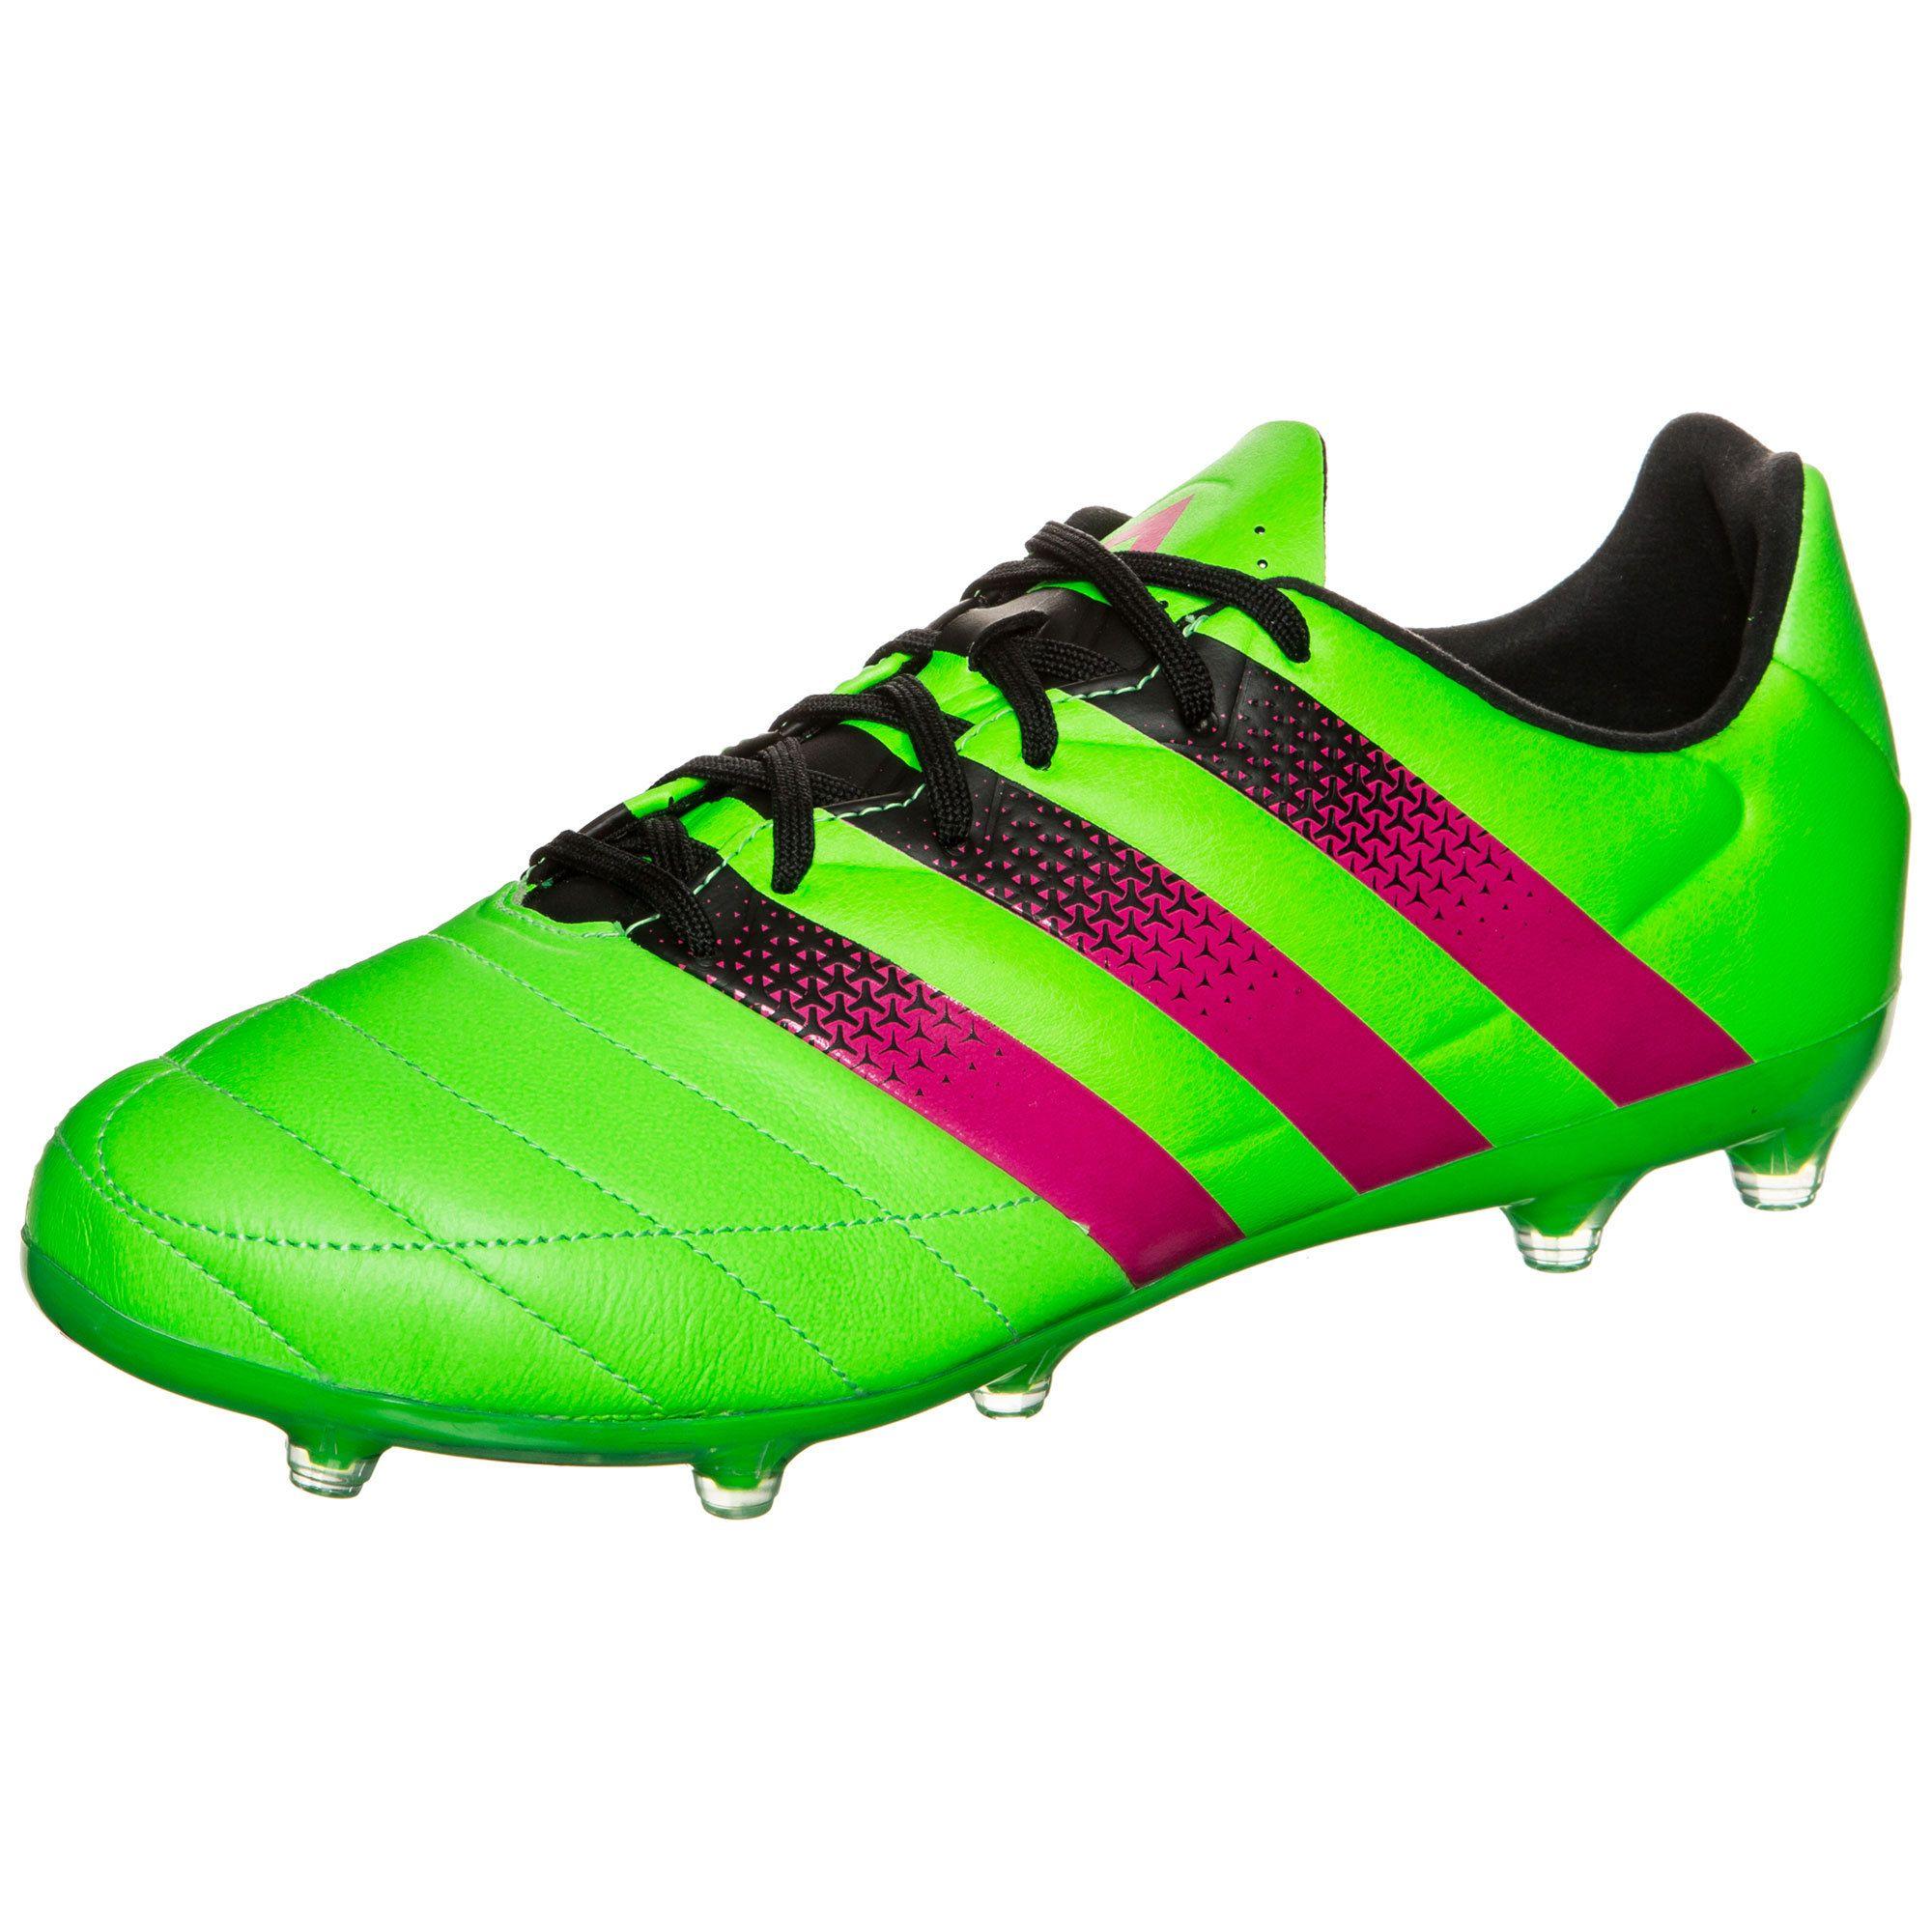 ADIDAS PERFORMANCE adidas Performance ACE 16.2 FG/AG Leather Fußballschuh Herren